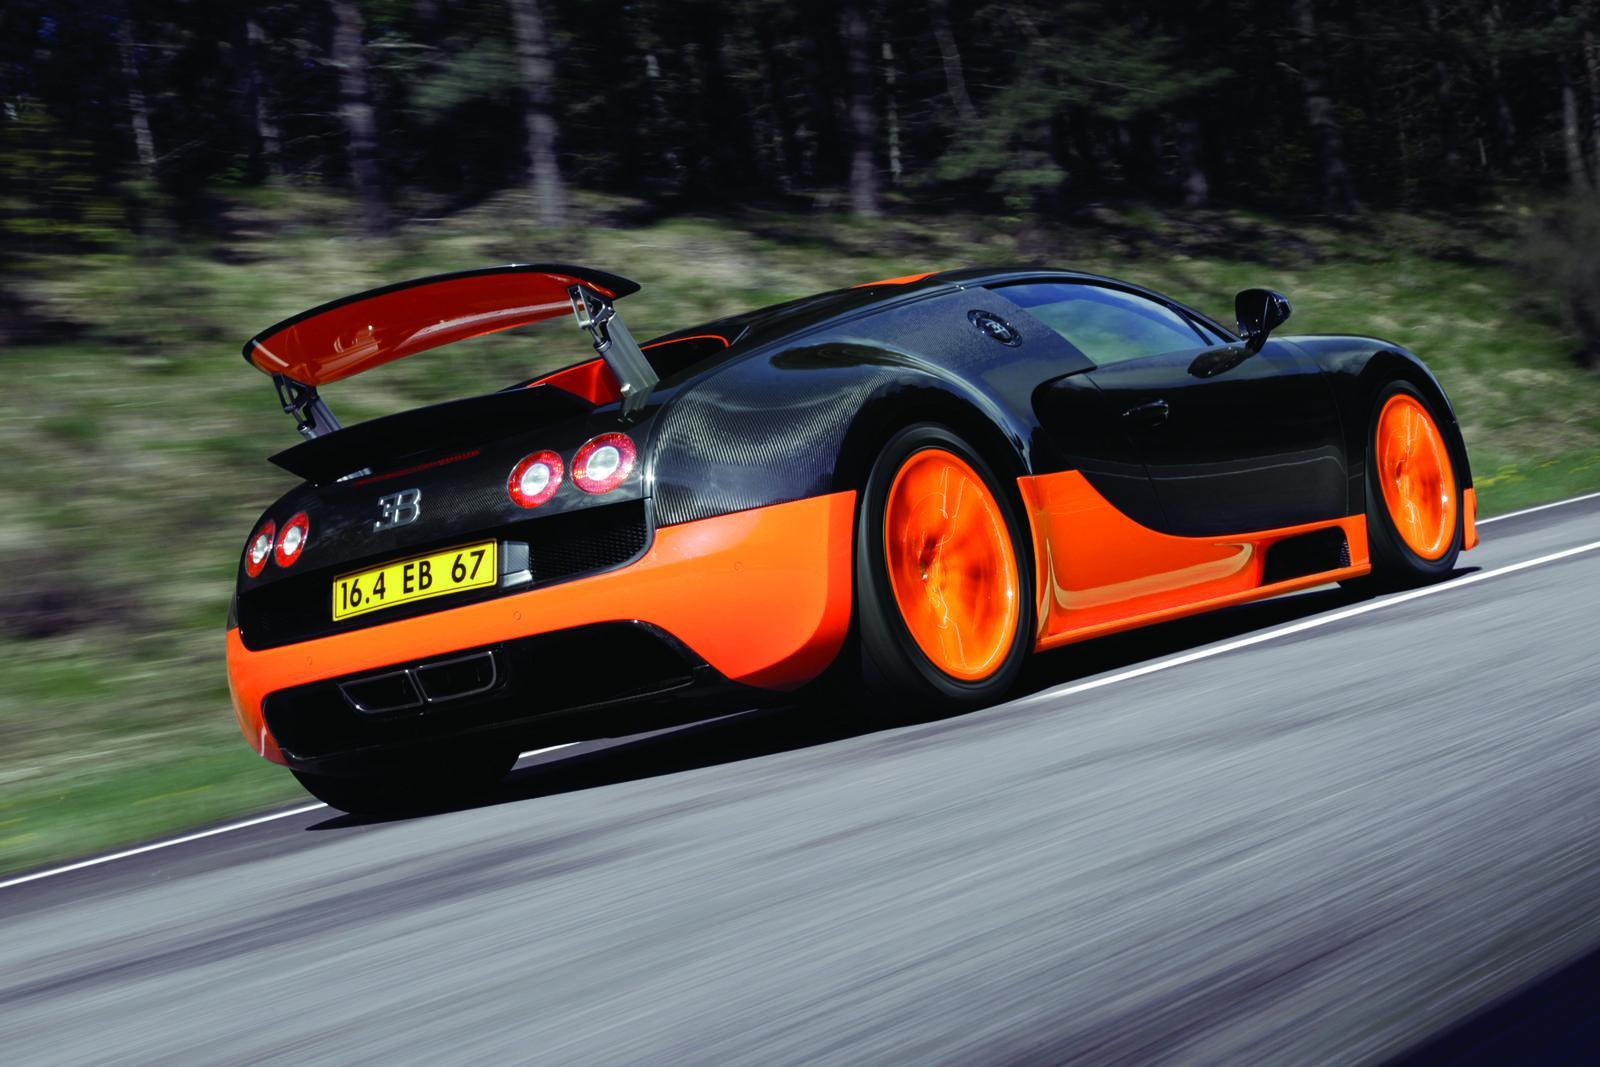 new cars latest 2010 bugatti veyron 16 4 super sport photos. Black Bedroom Furniture Sets. Home Design Ideas